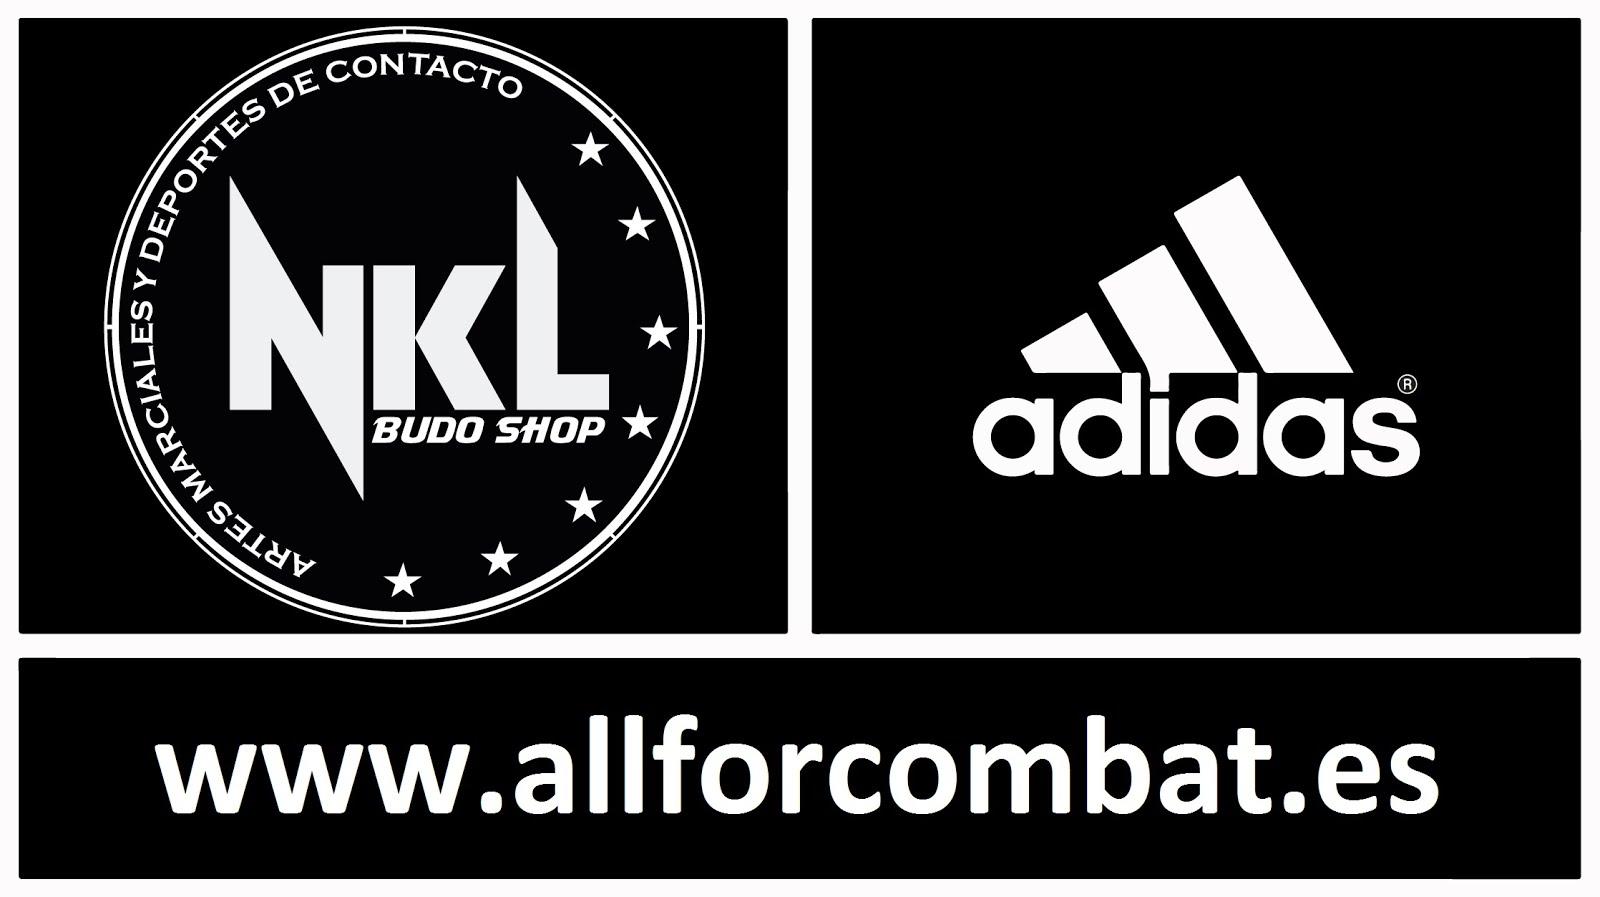 #allforcombat  #adidastkd